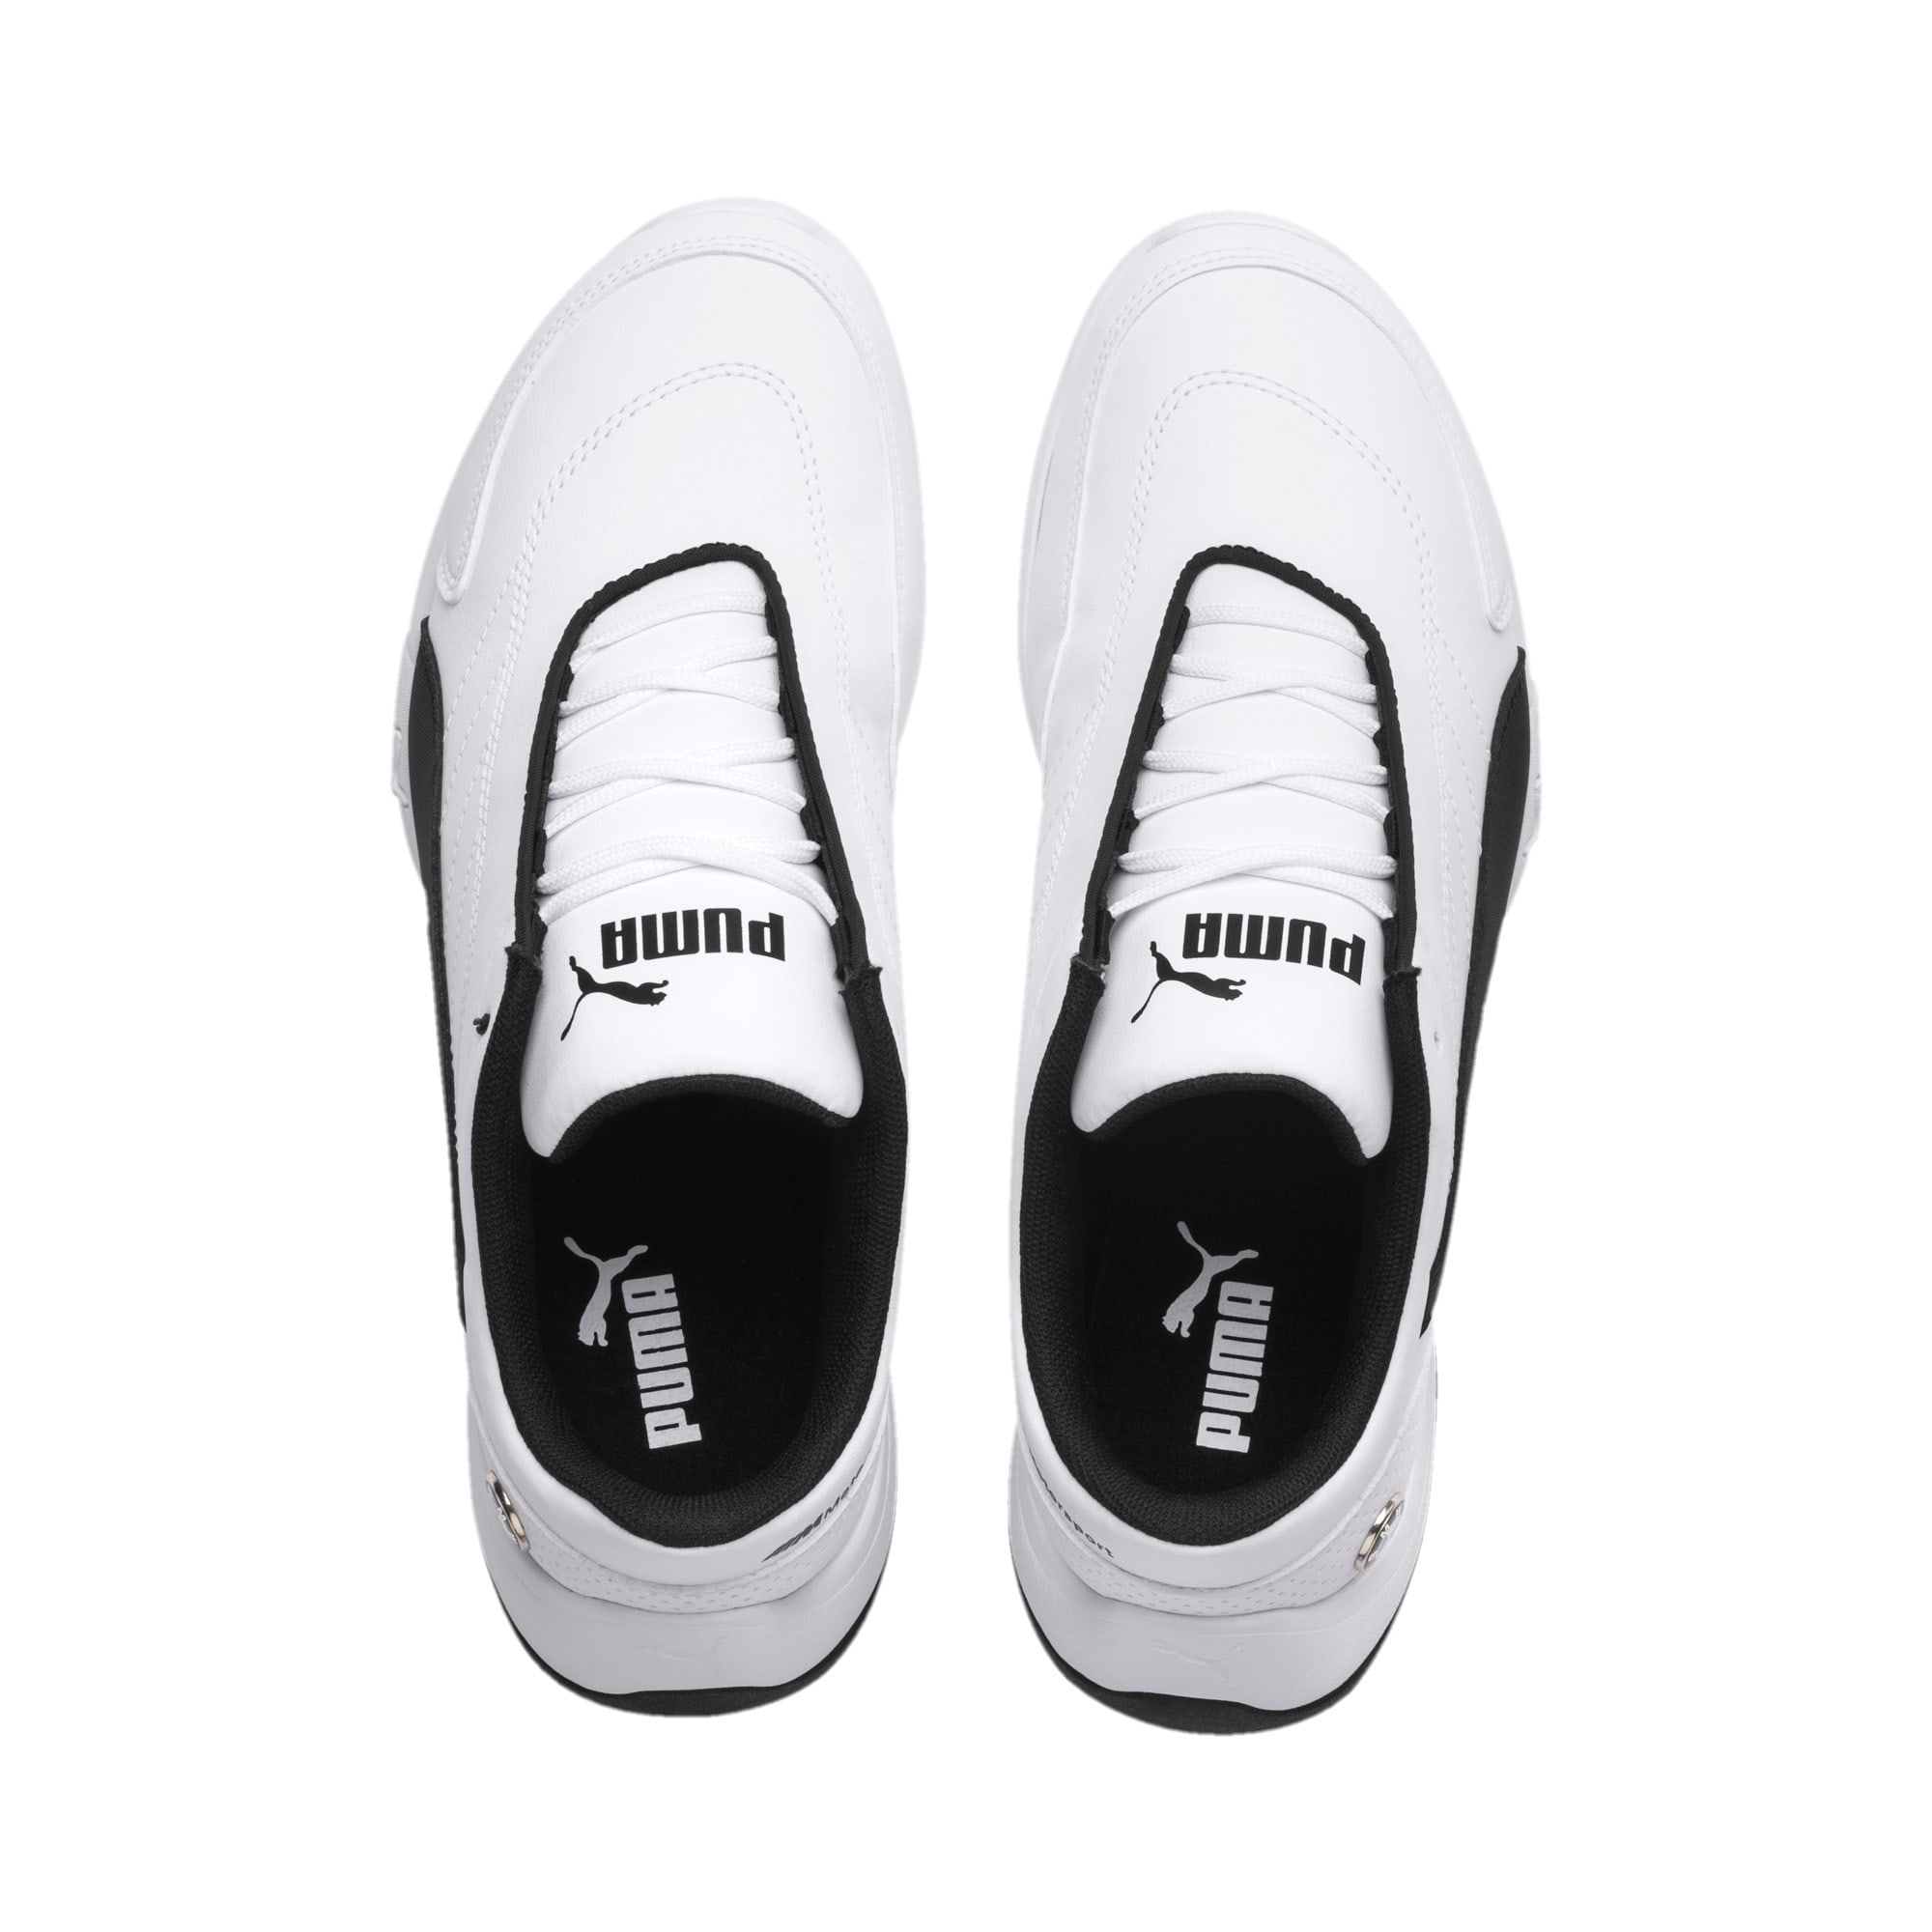 Thumbnail 6 of BMW MMS Kart Cat III Shoes JR, Puma White-Puma Black, medium